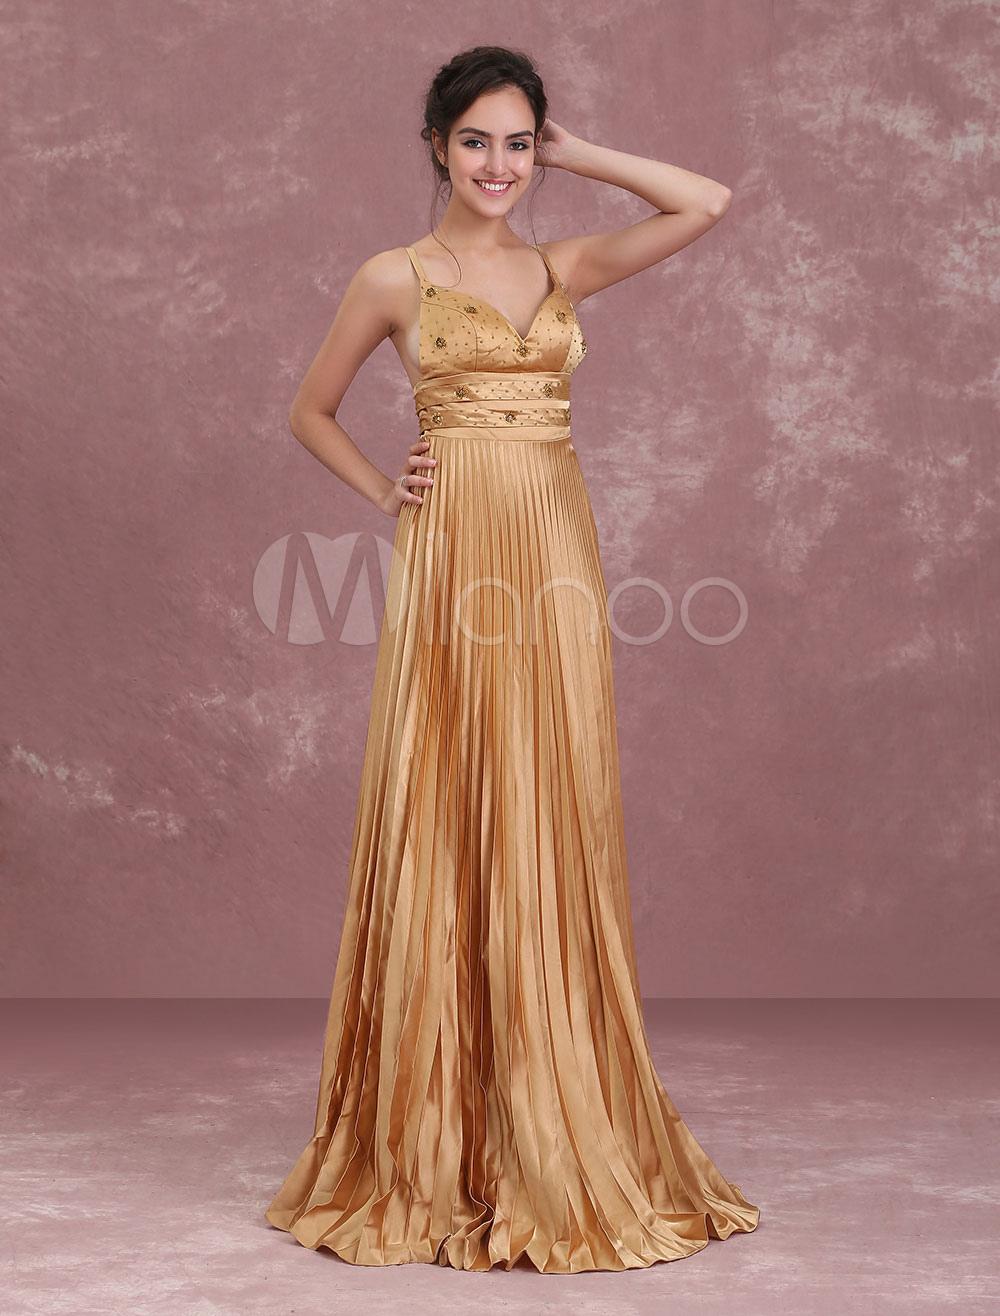 4f0ccef434d ... Long Homecoming Dresses Light Gold Pleated Satin Prom Dress Spaghetti  Straps Beaded Floor Length Formal Slip ...